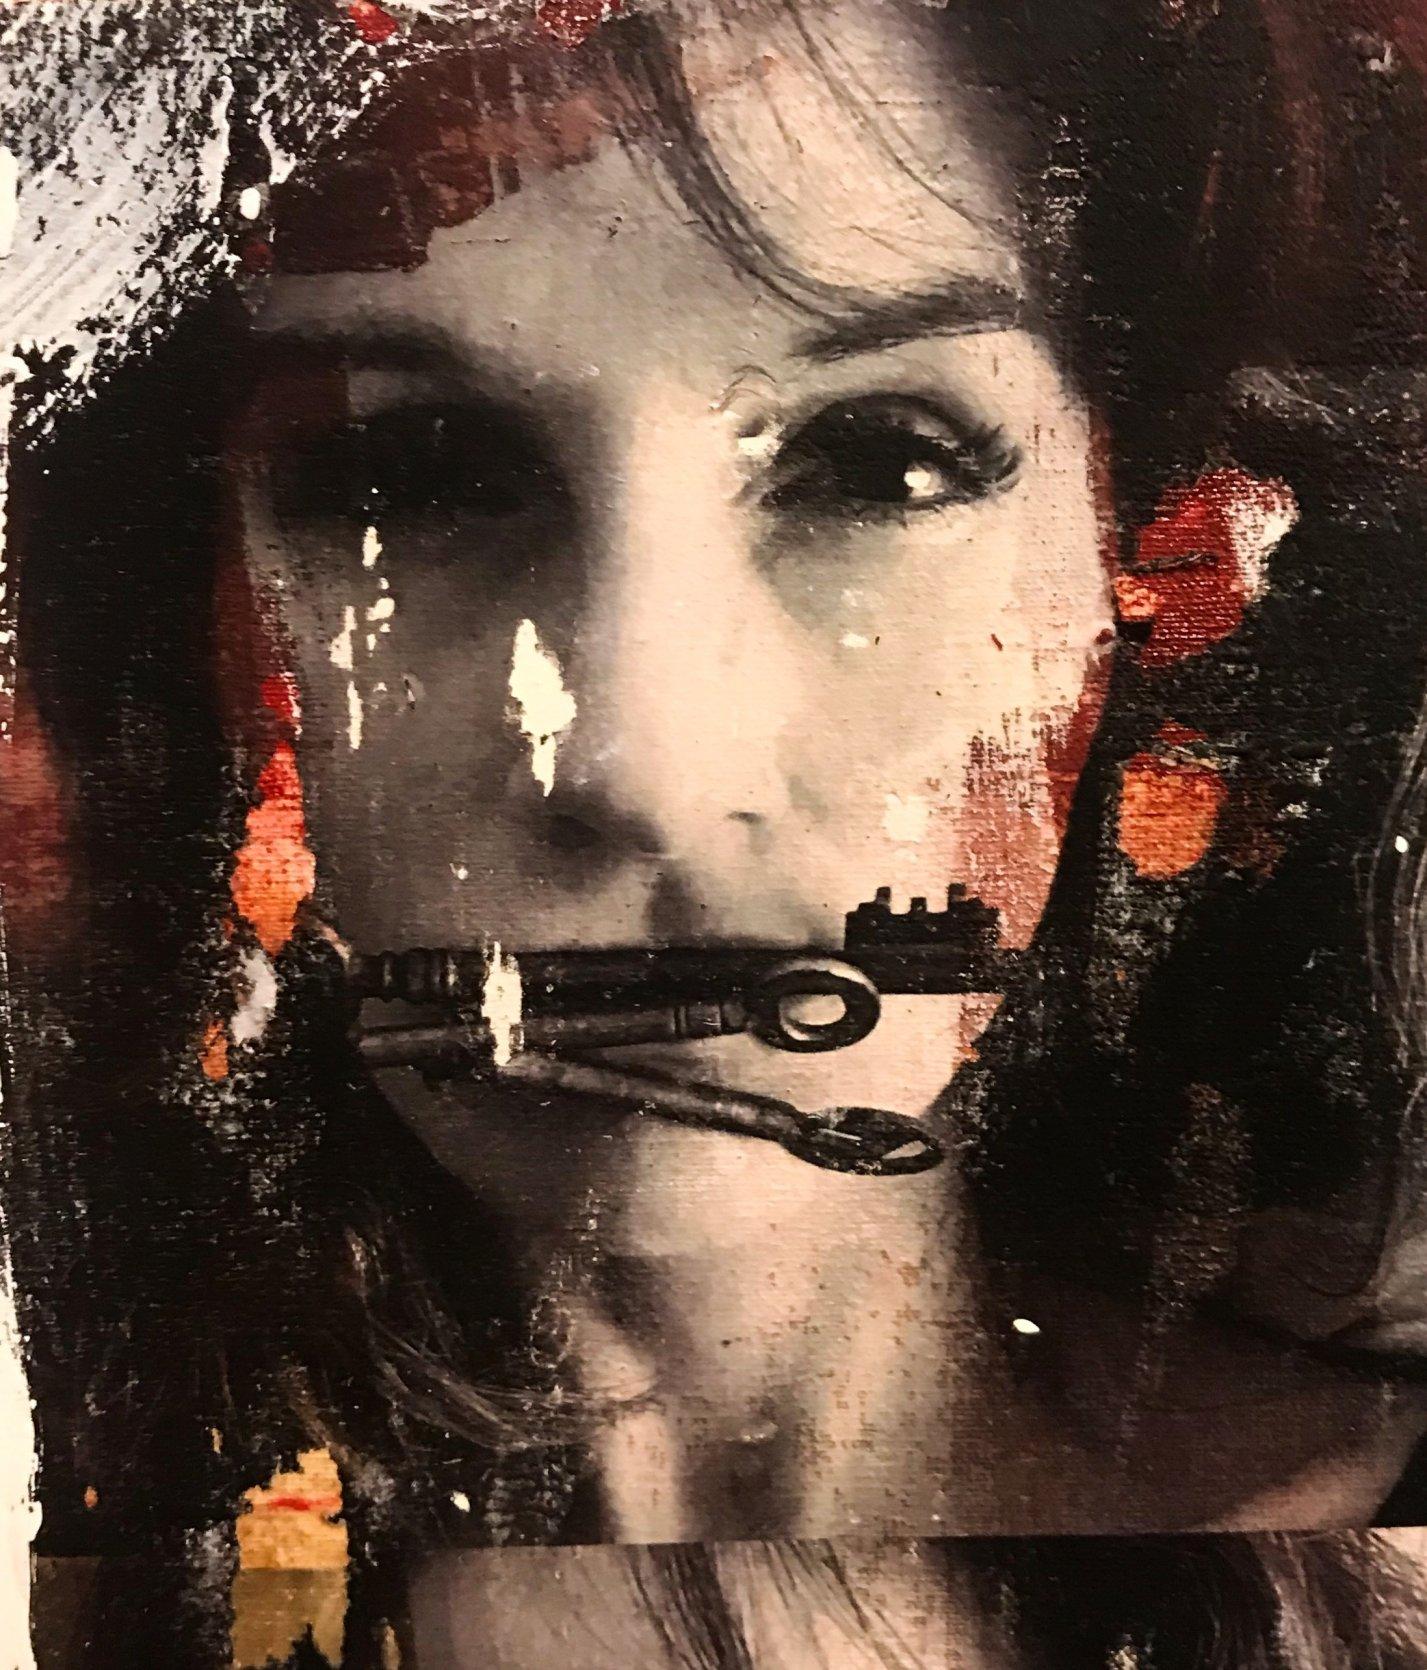 Sin Título. Detalle (2019) - Paola Ferraris